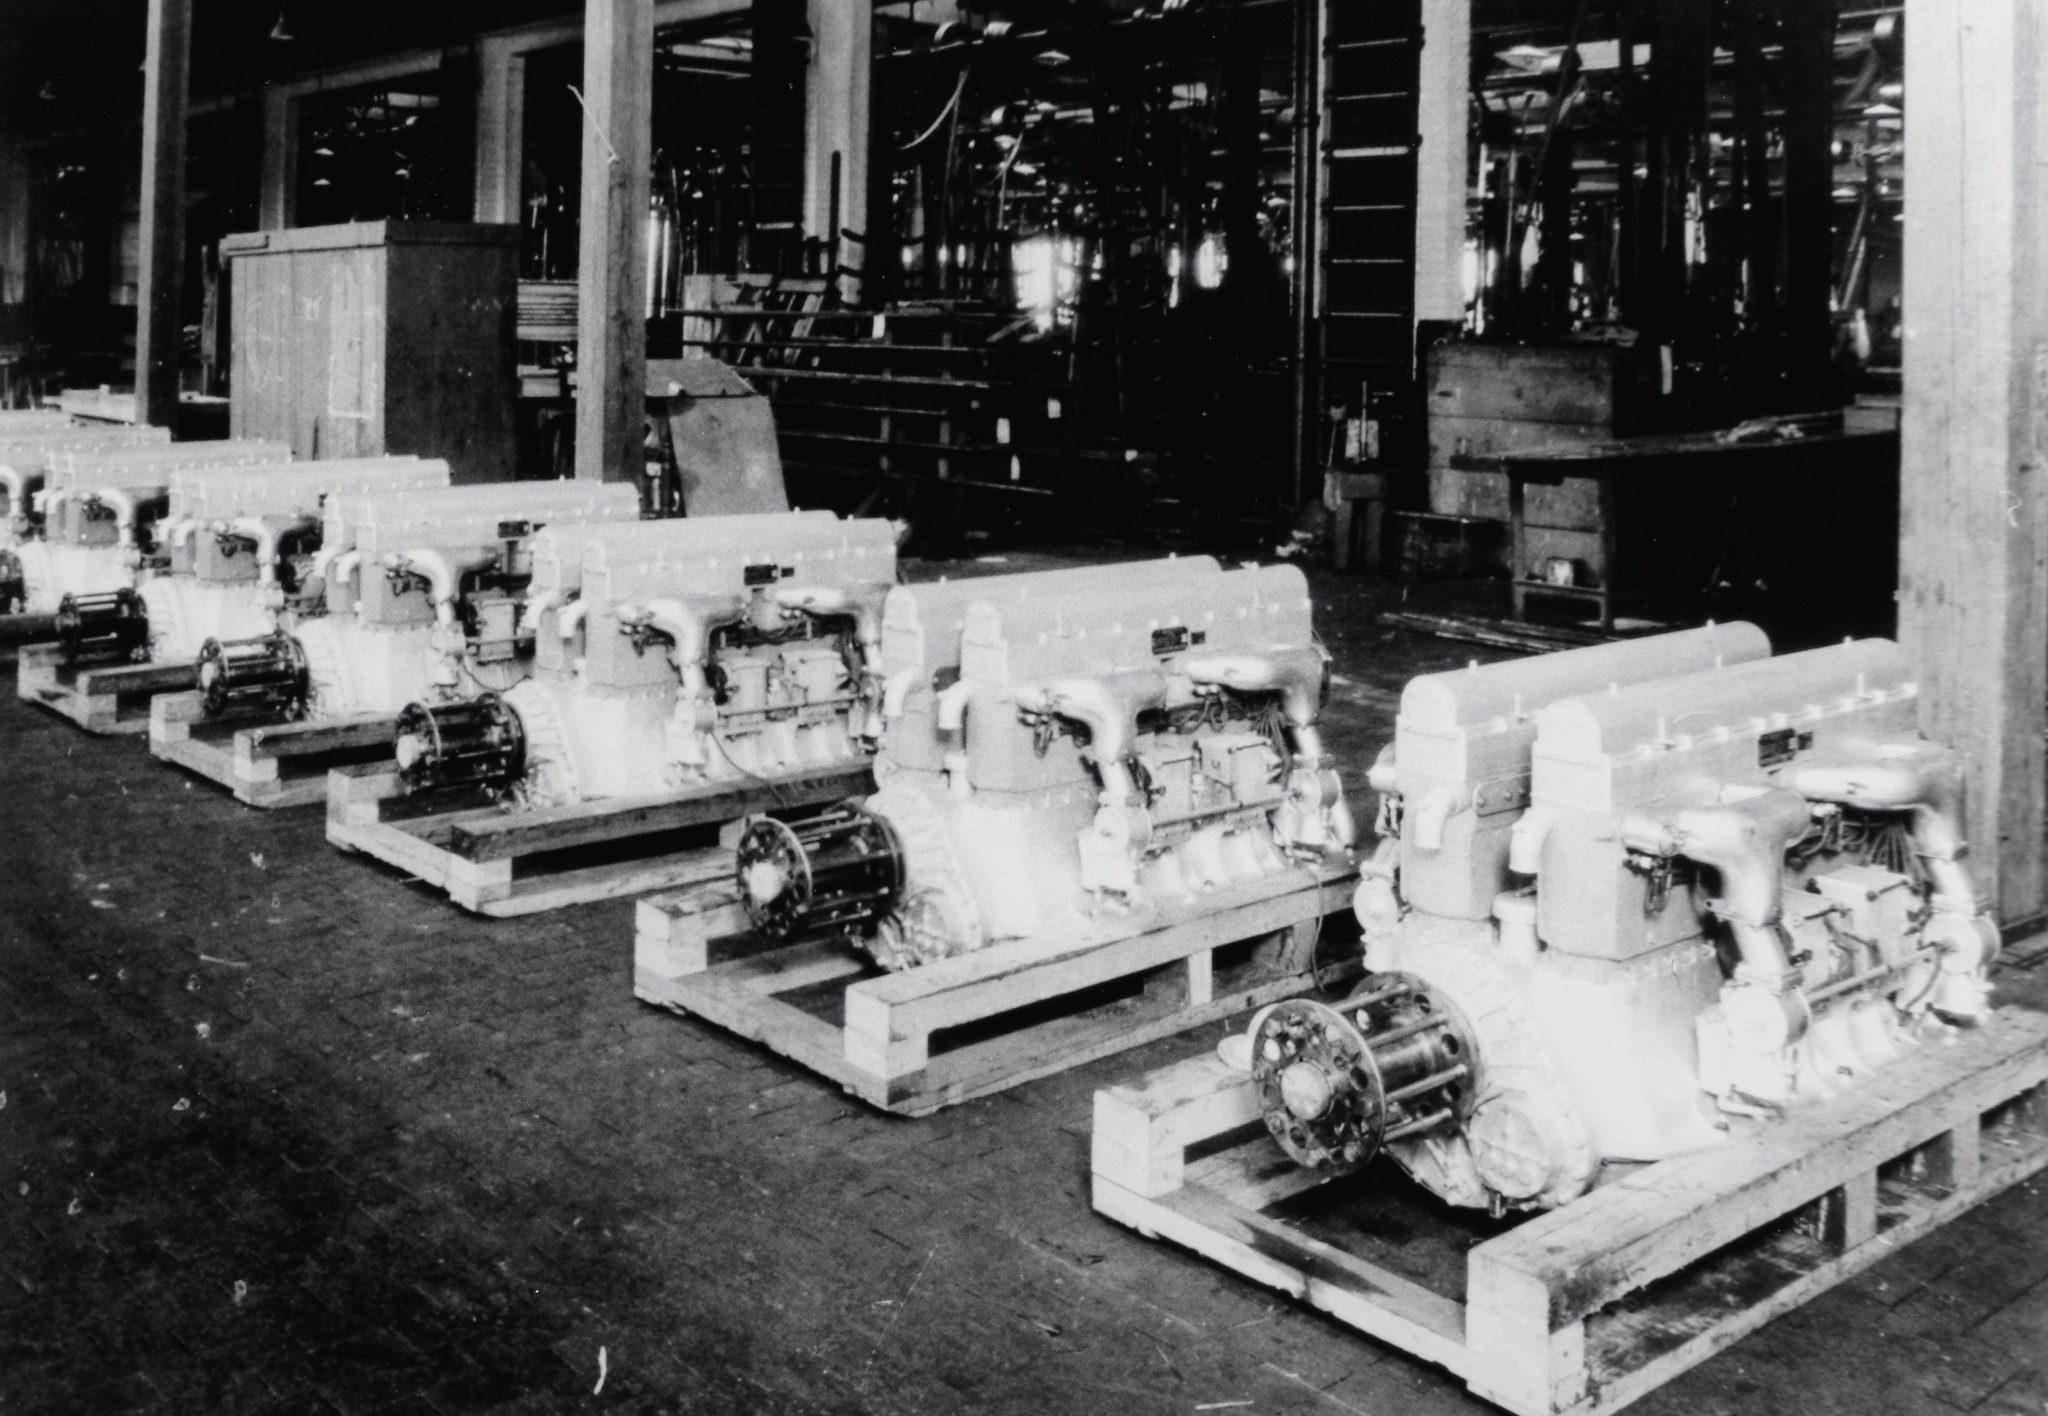 Bugatti U.S. sixteen-cylinder aircraft engines U-16